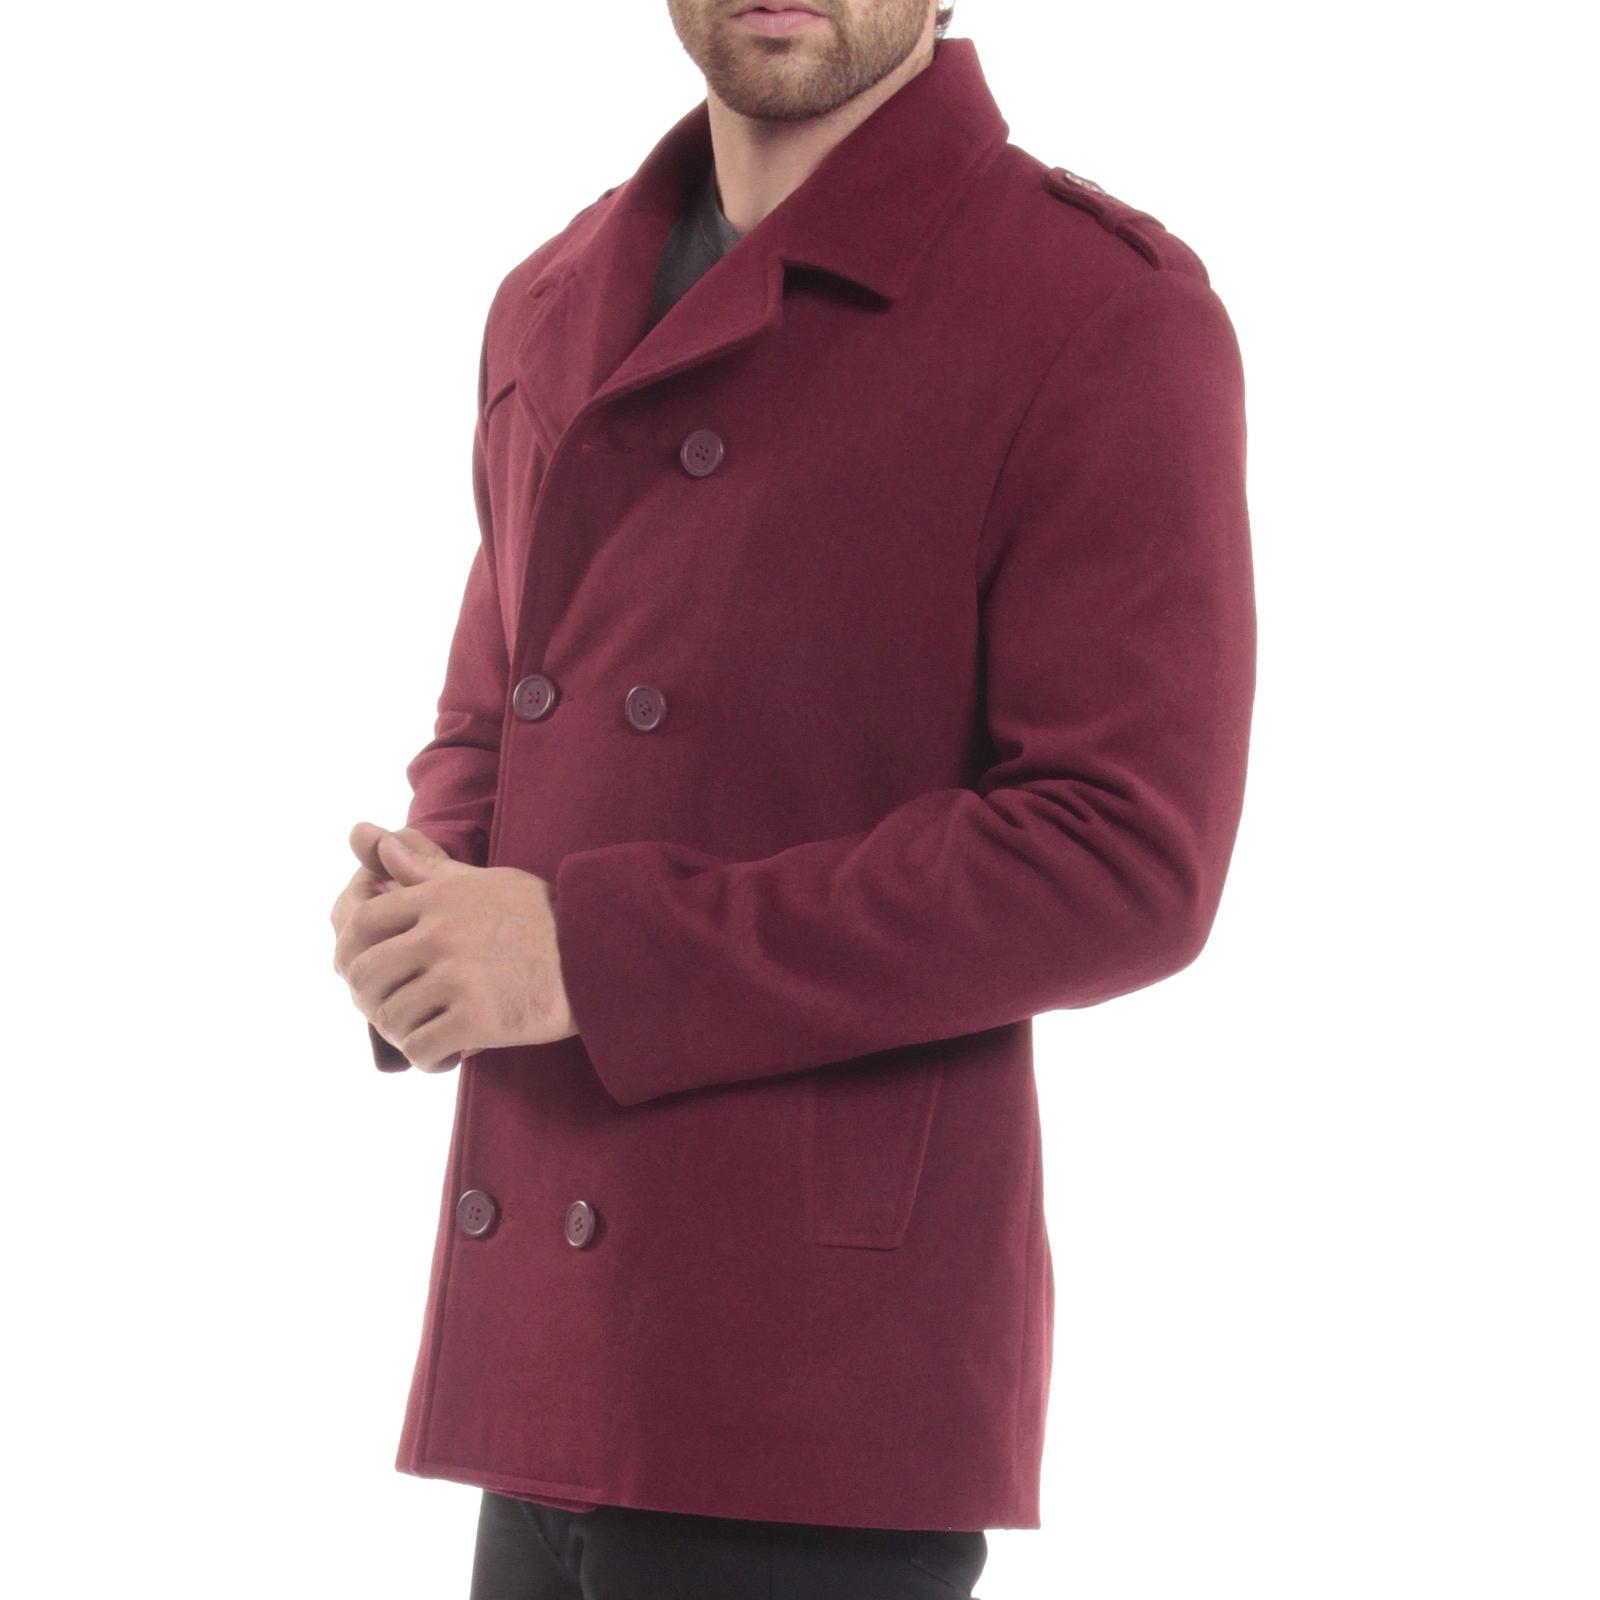 Alpine Swiss Jake Mens Pea Coat Wool Blend Double Breasted Dress ...